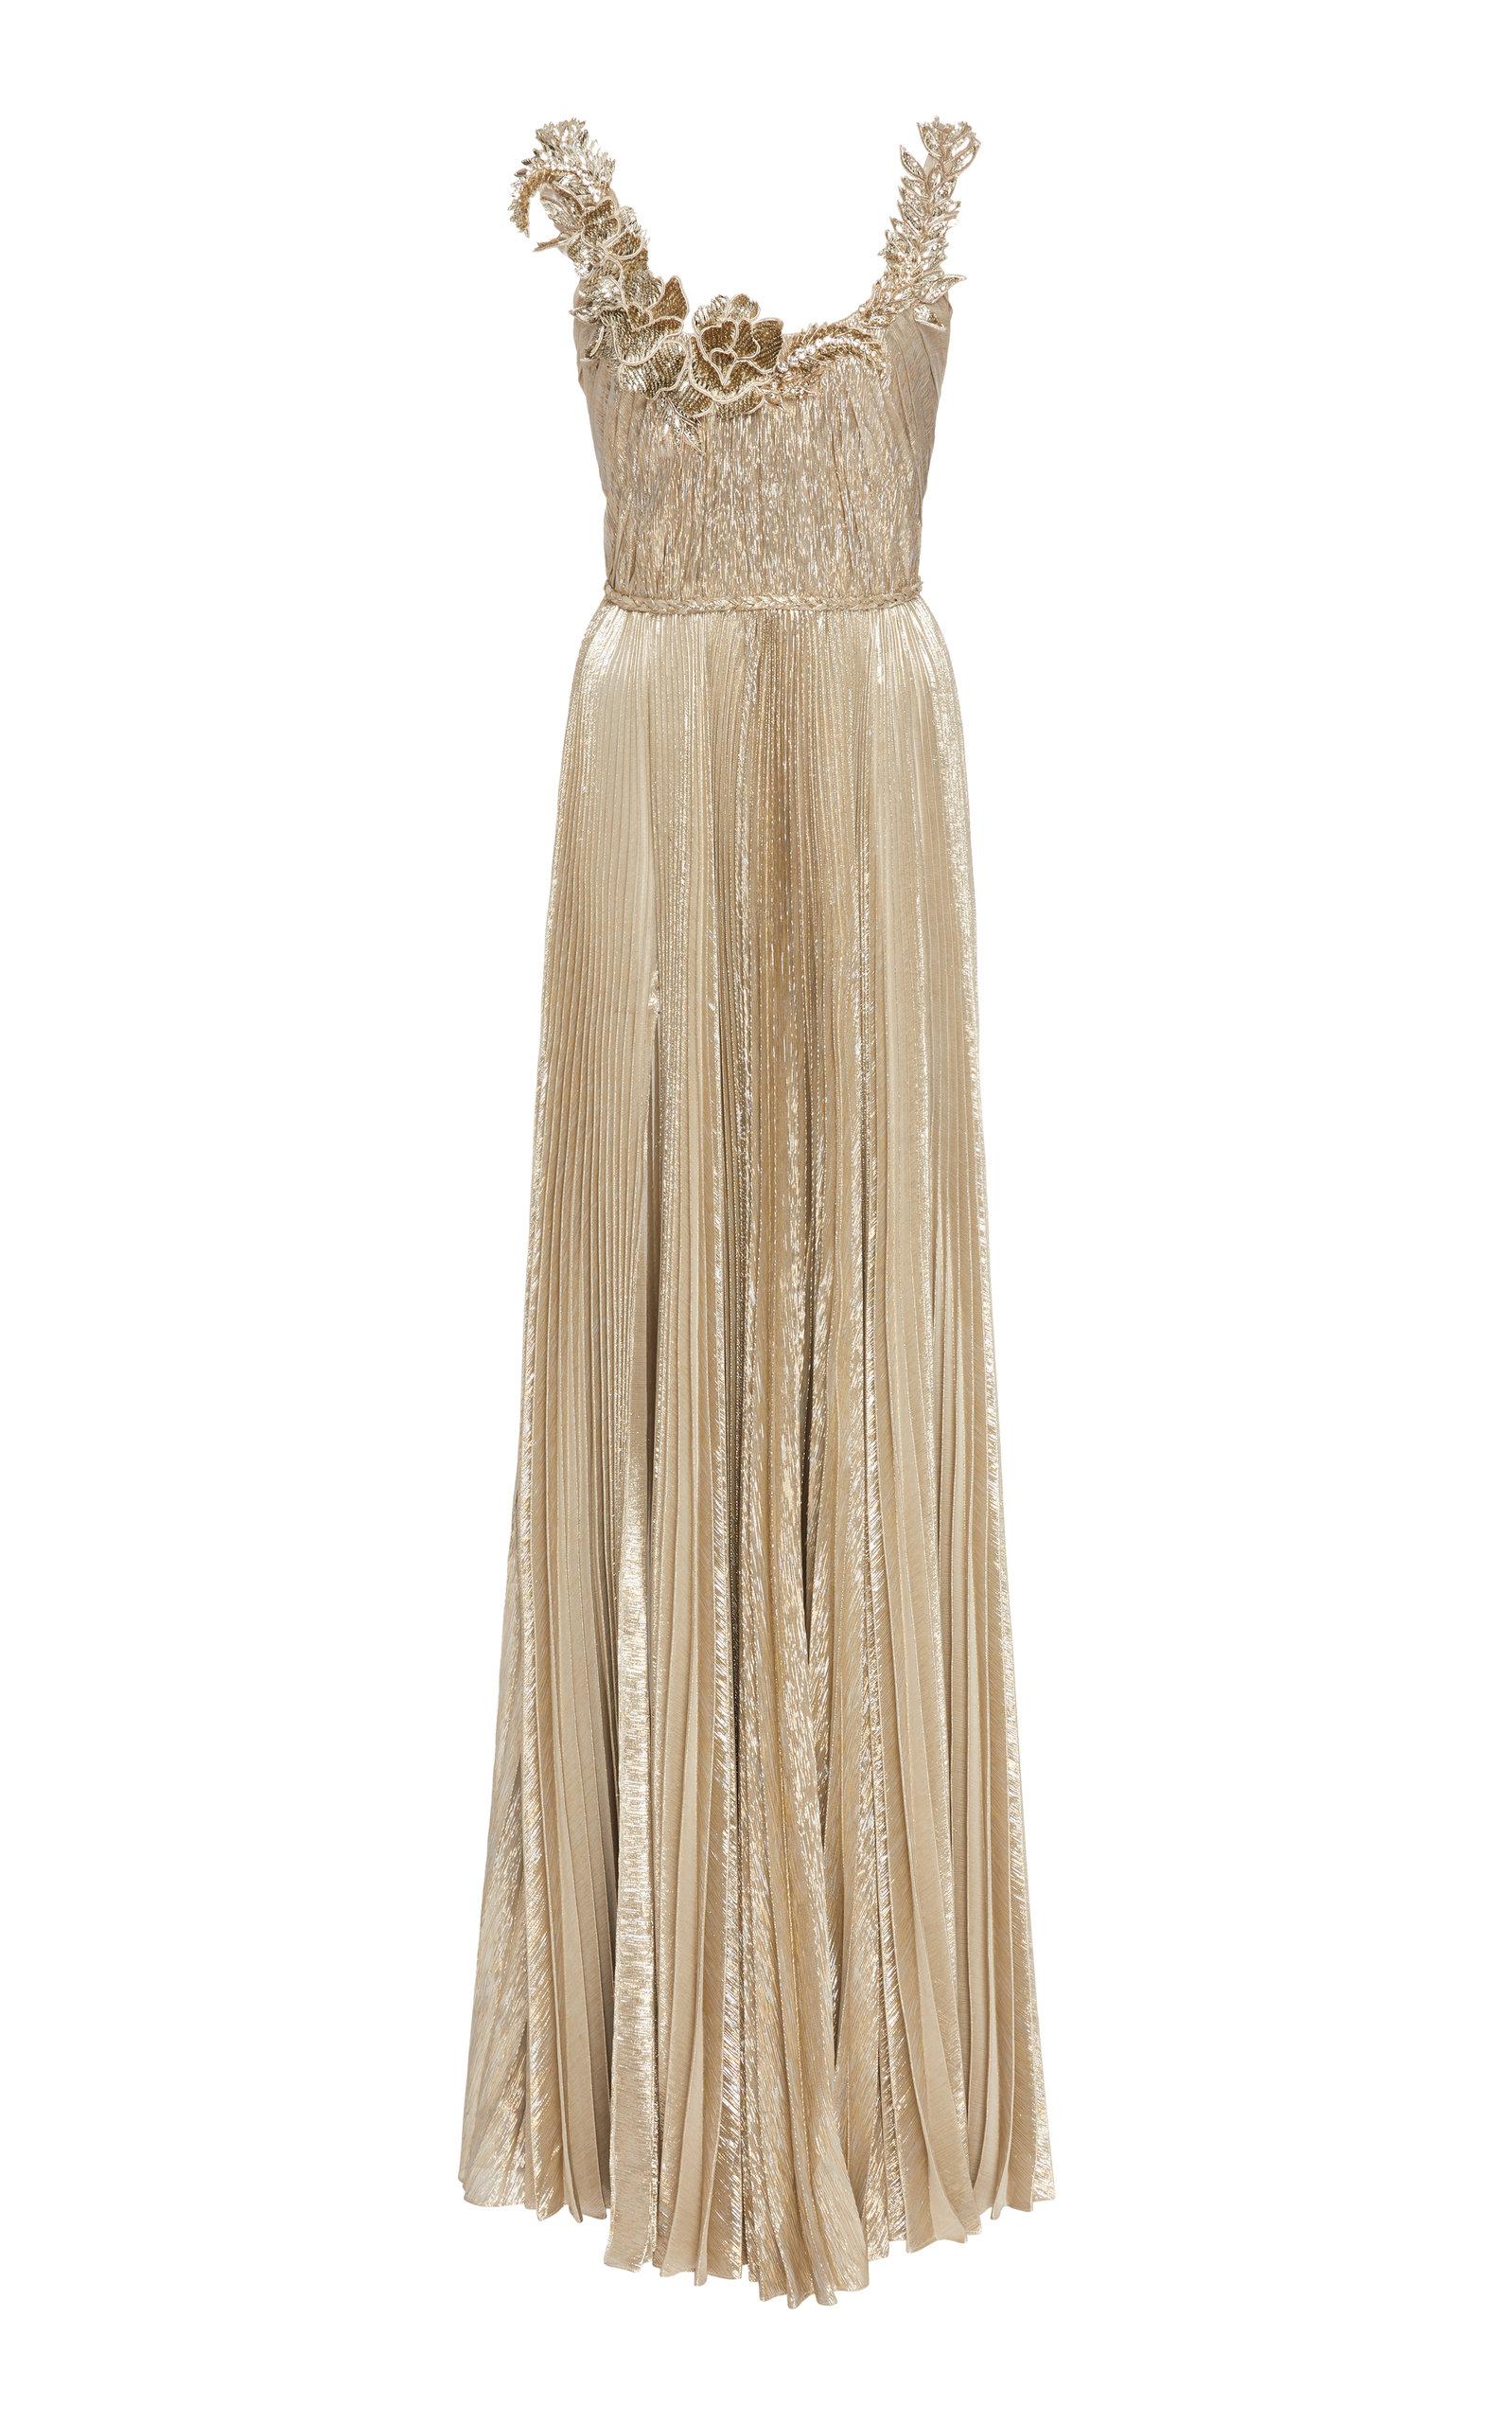 Buy Oscar de la Renta Embellished Metallic Plissé Gown online, shop Oscar de la Renta at the best price